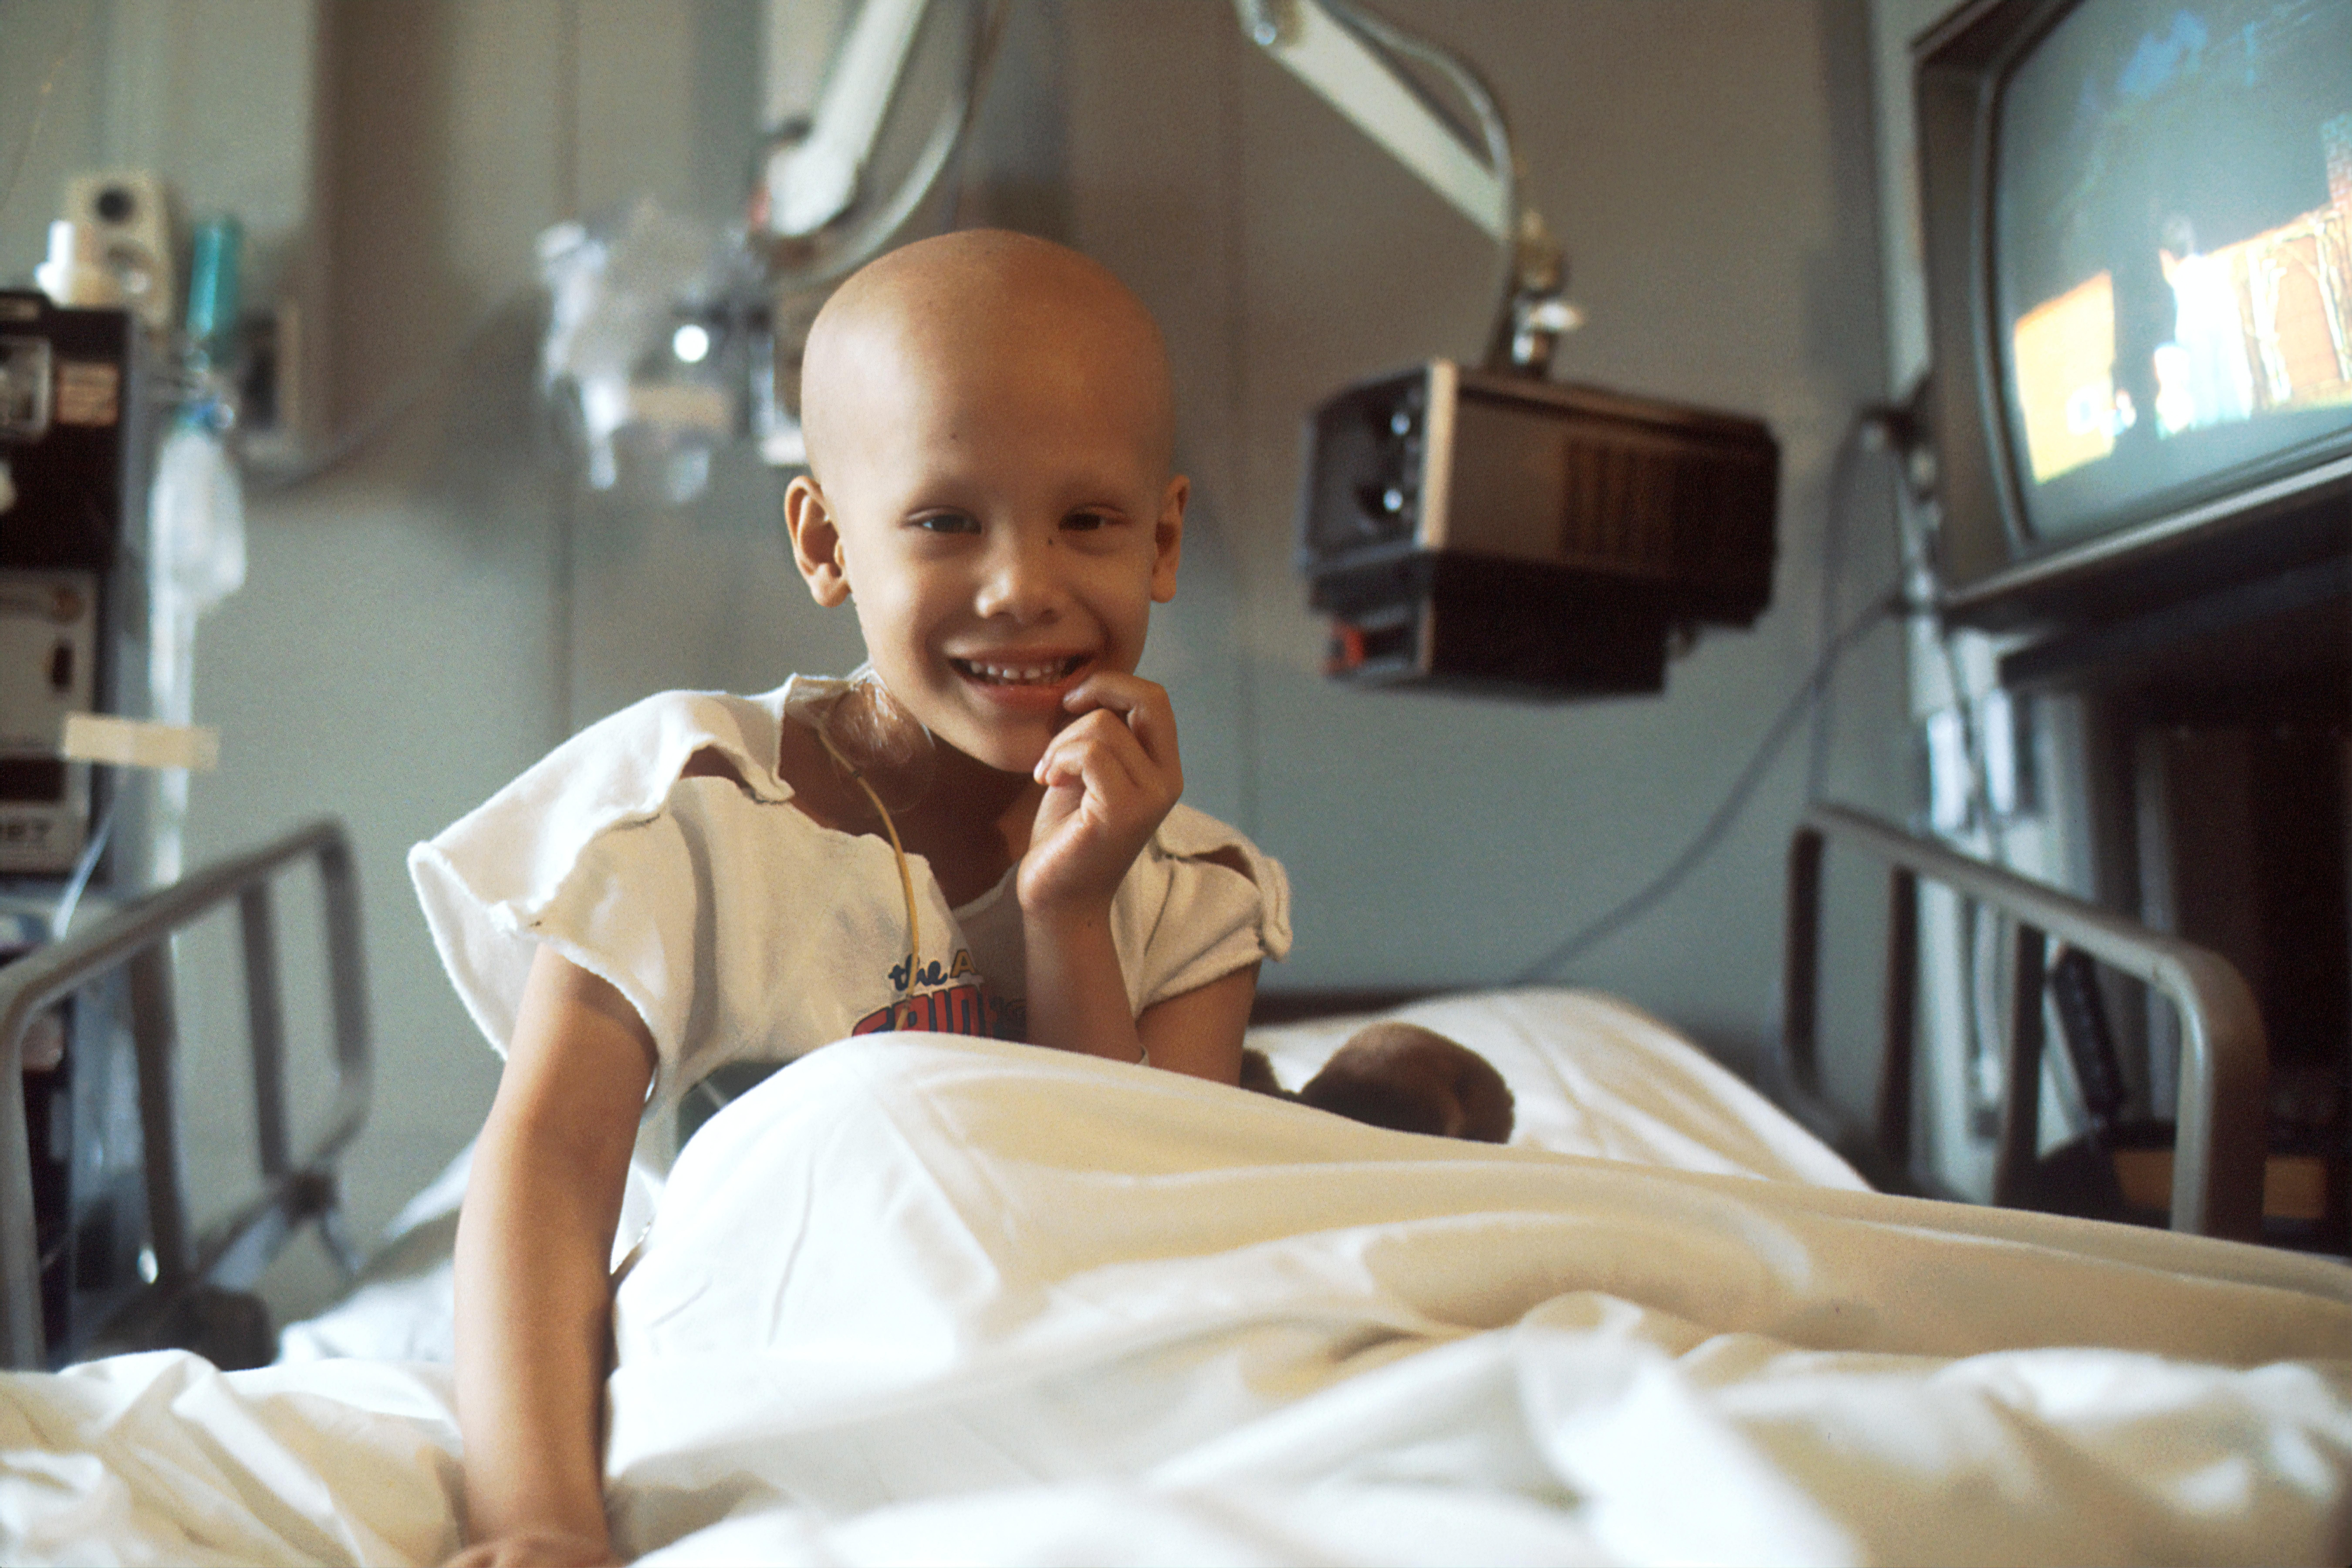 de cáncer pediátrico